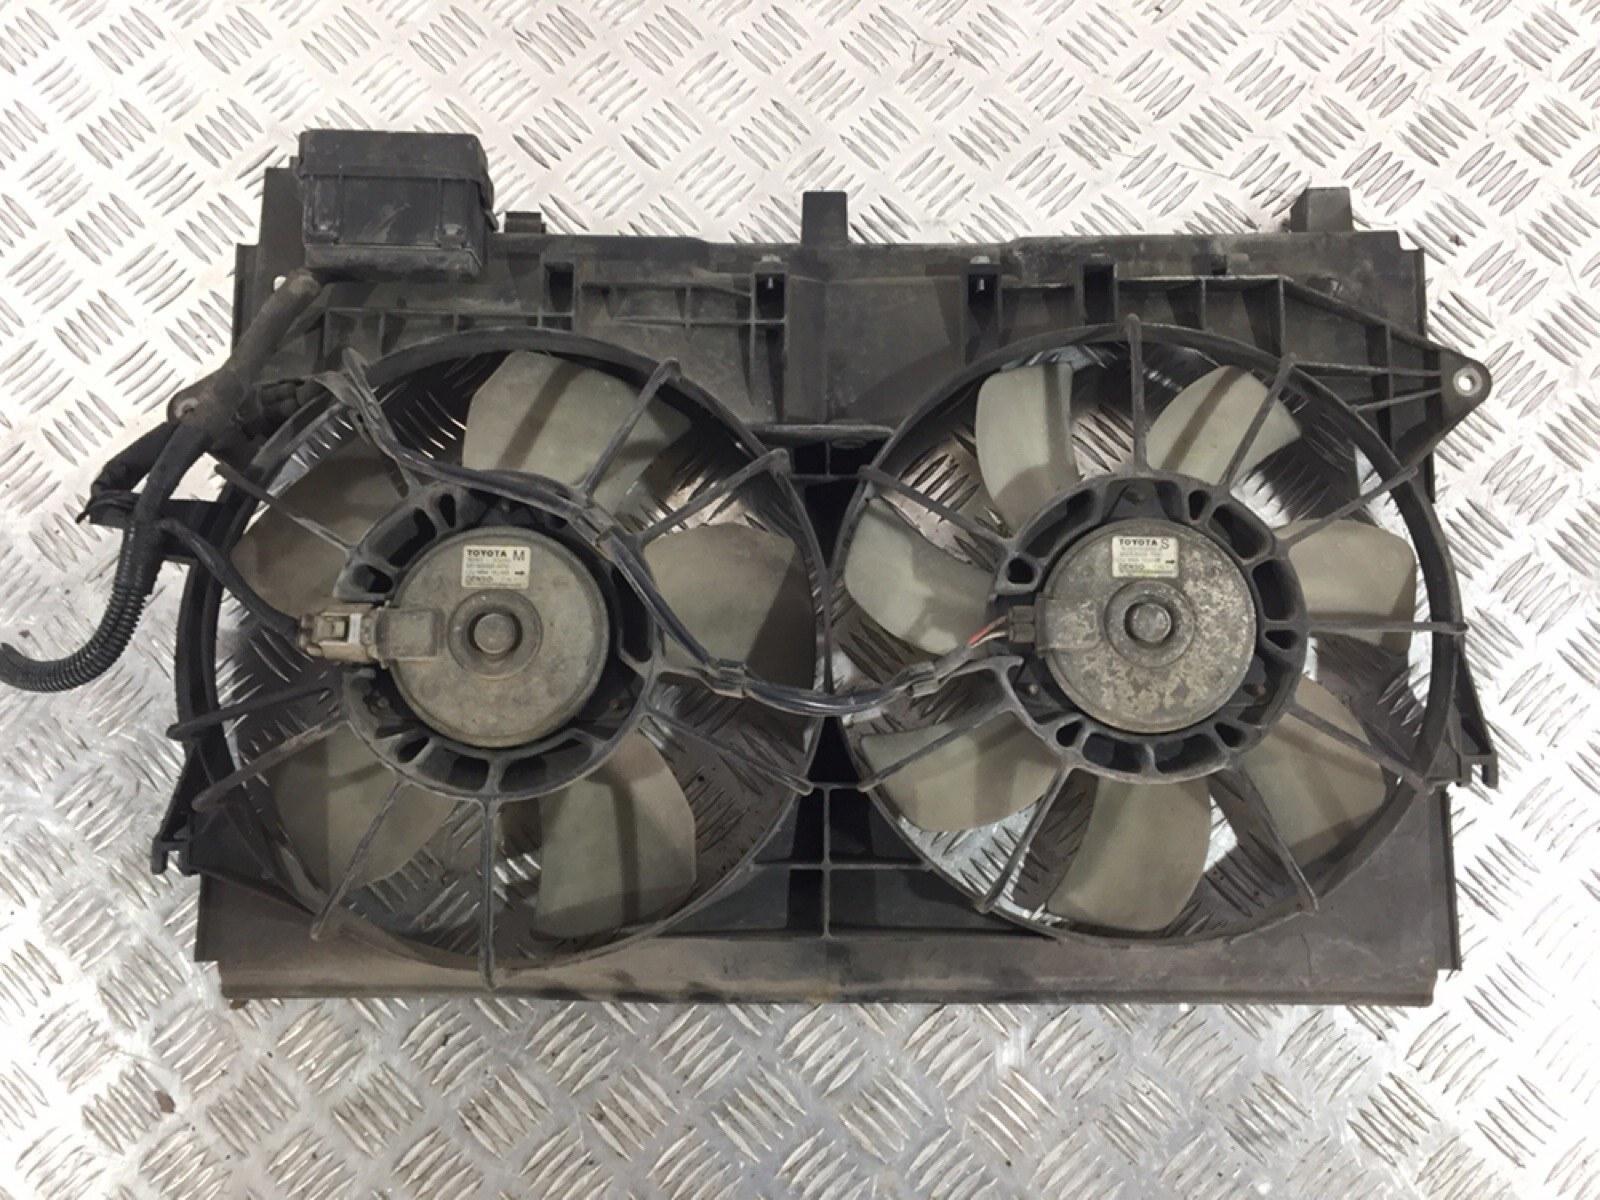 Вентилятор радиатора Toyota Corolla 2.0 D-4D 2005 (б/у)